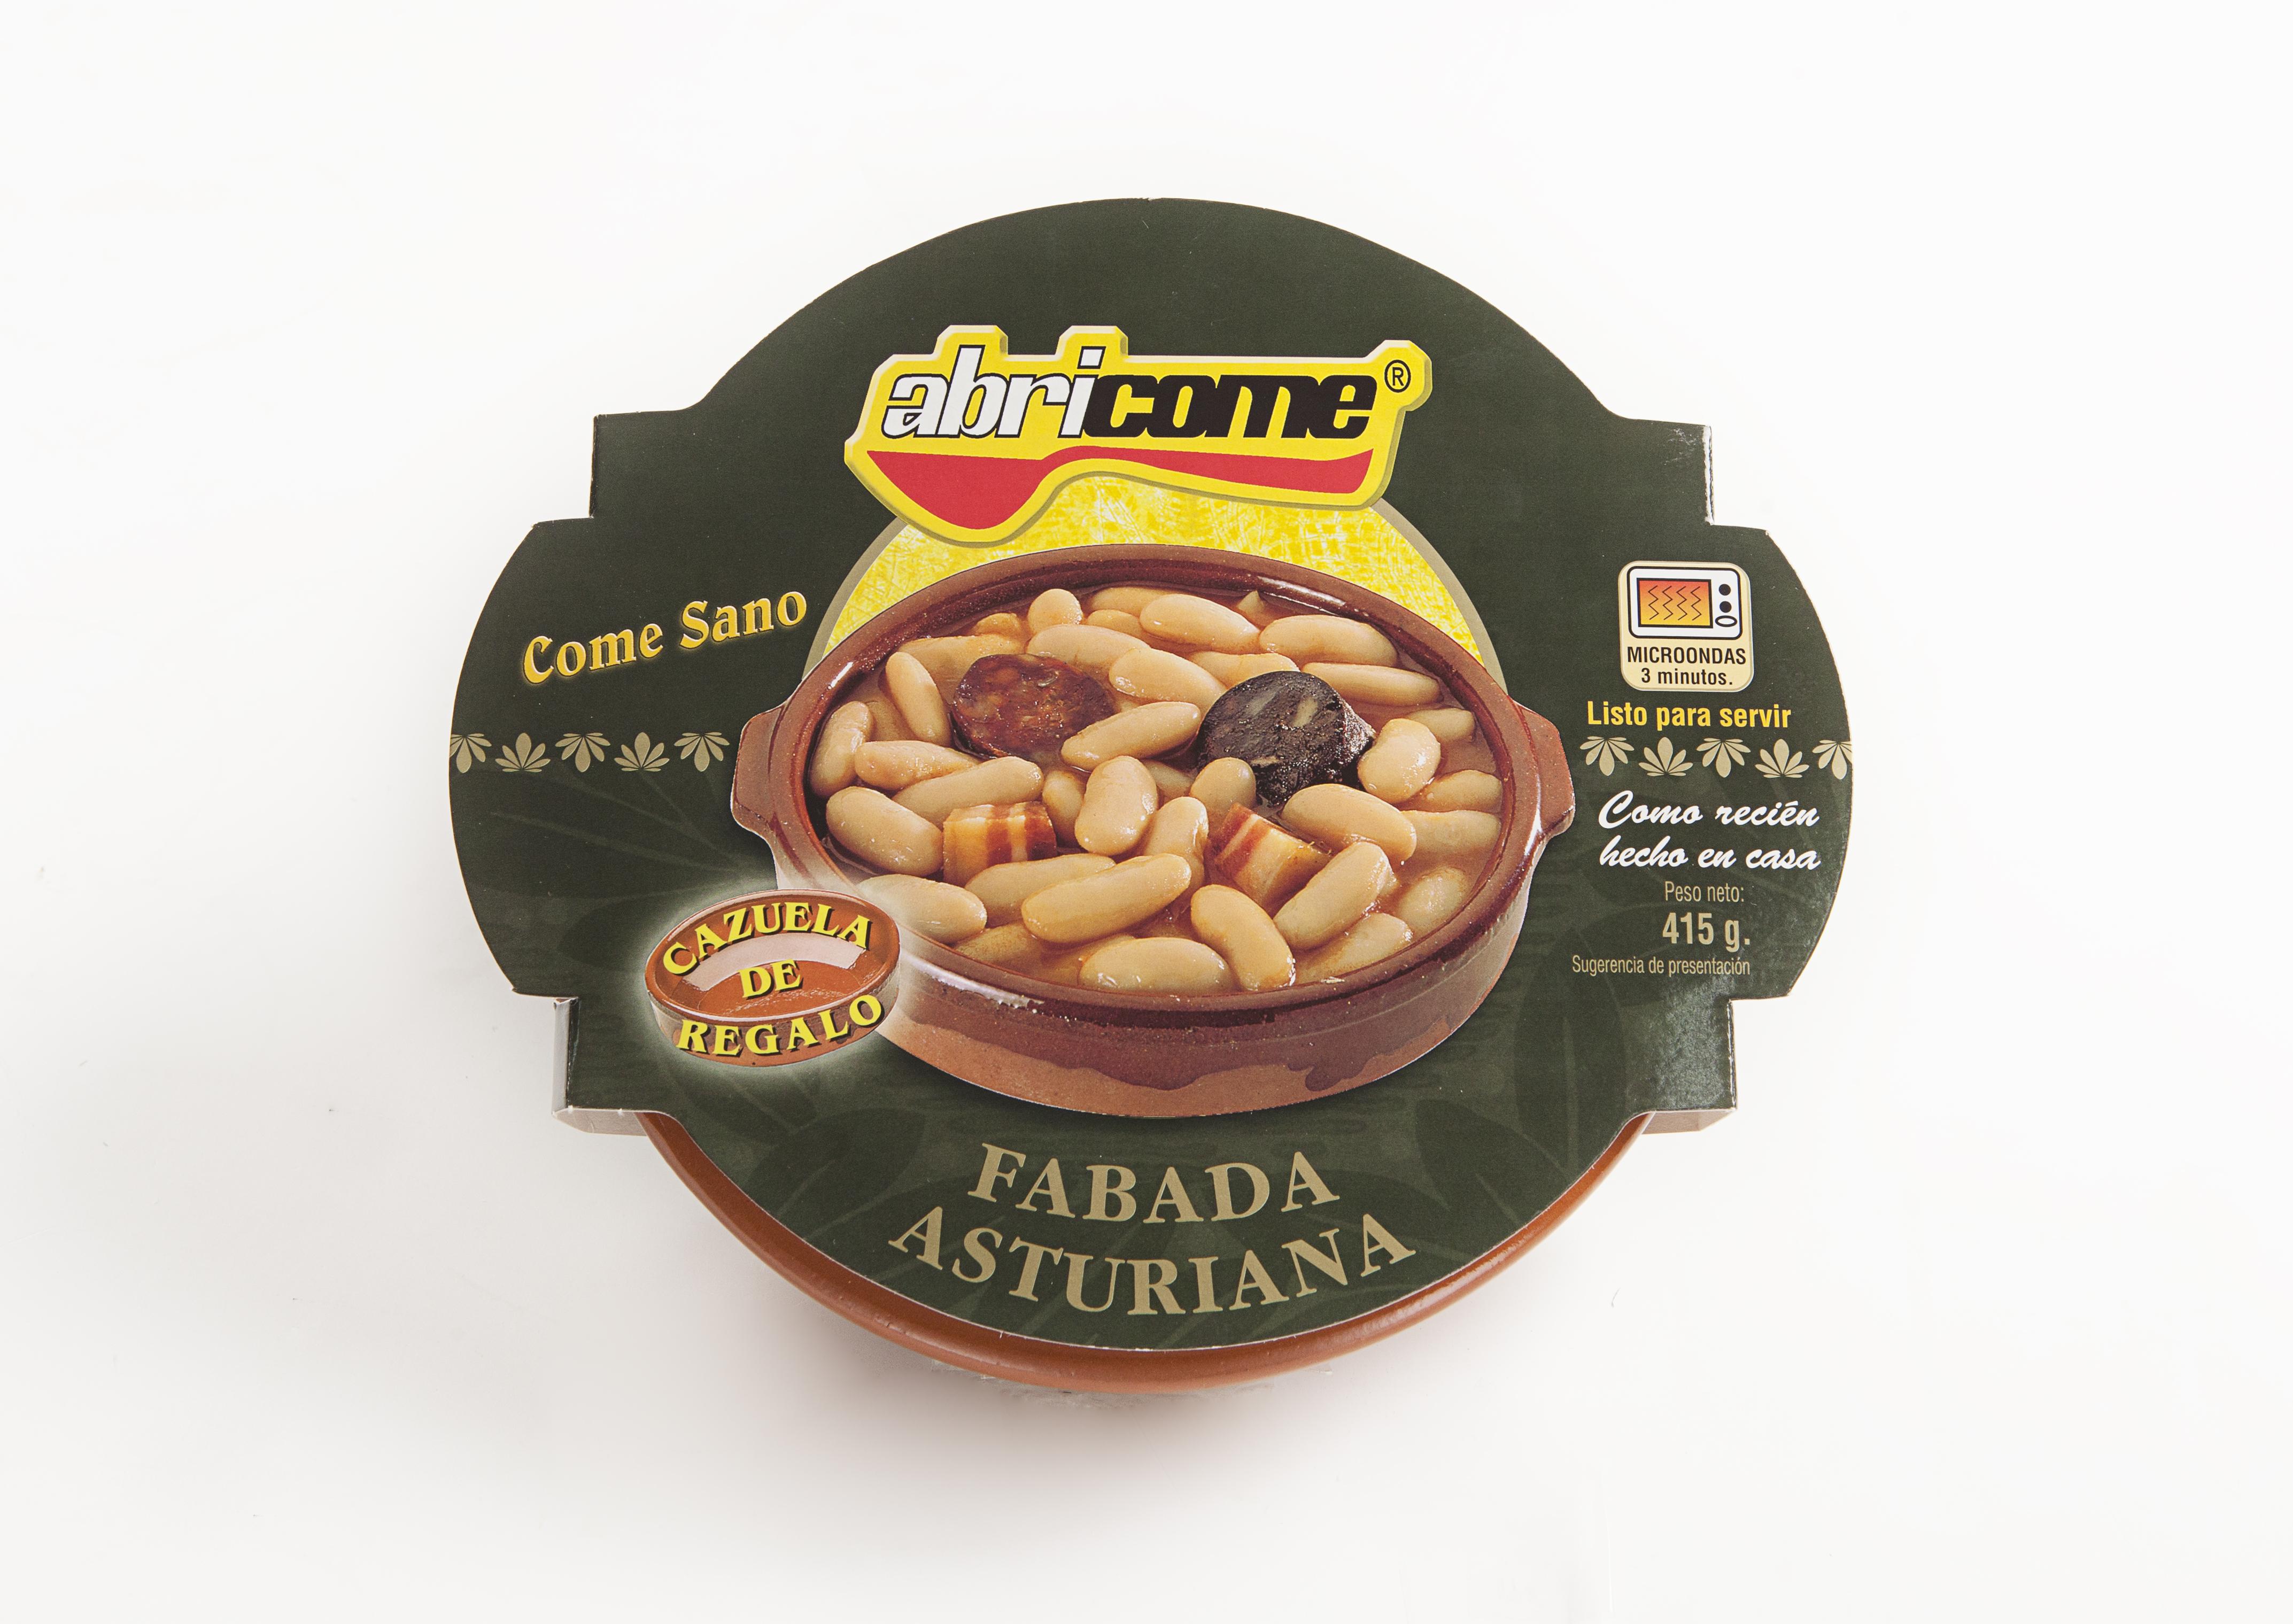 Caz. Fabada Asturiana